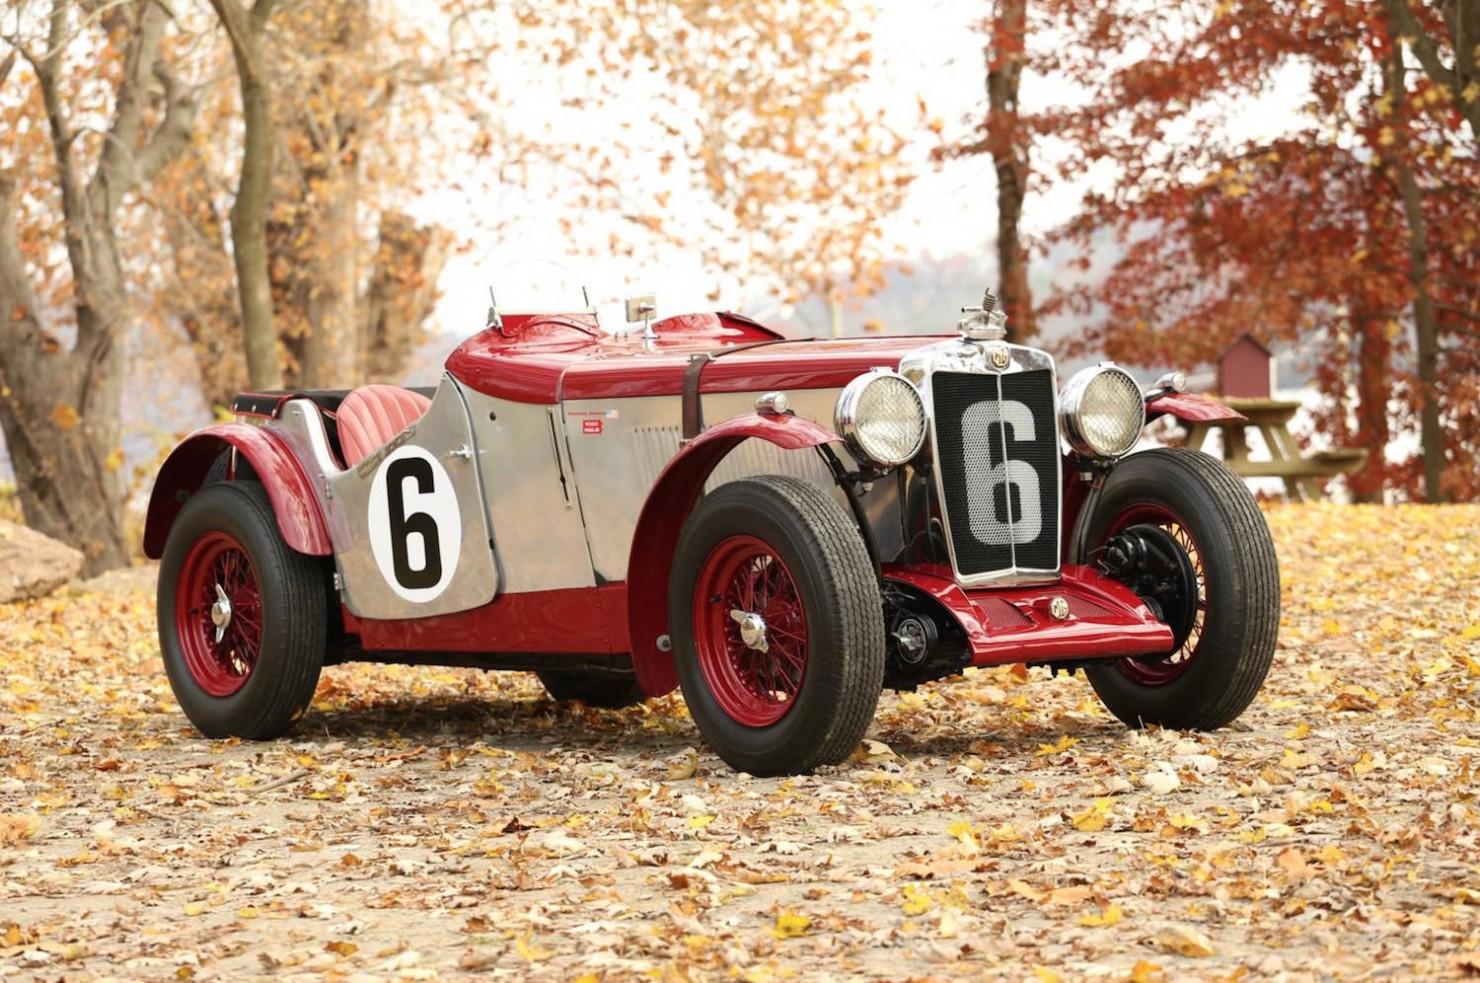 Vintage-MG-Racing-Car-8